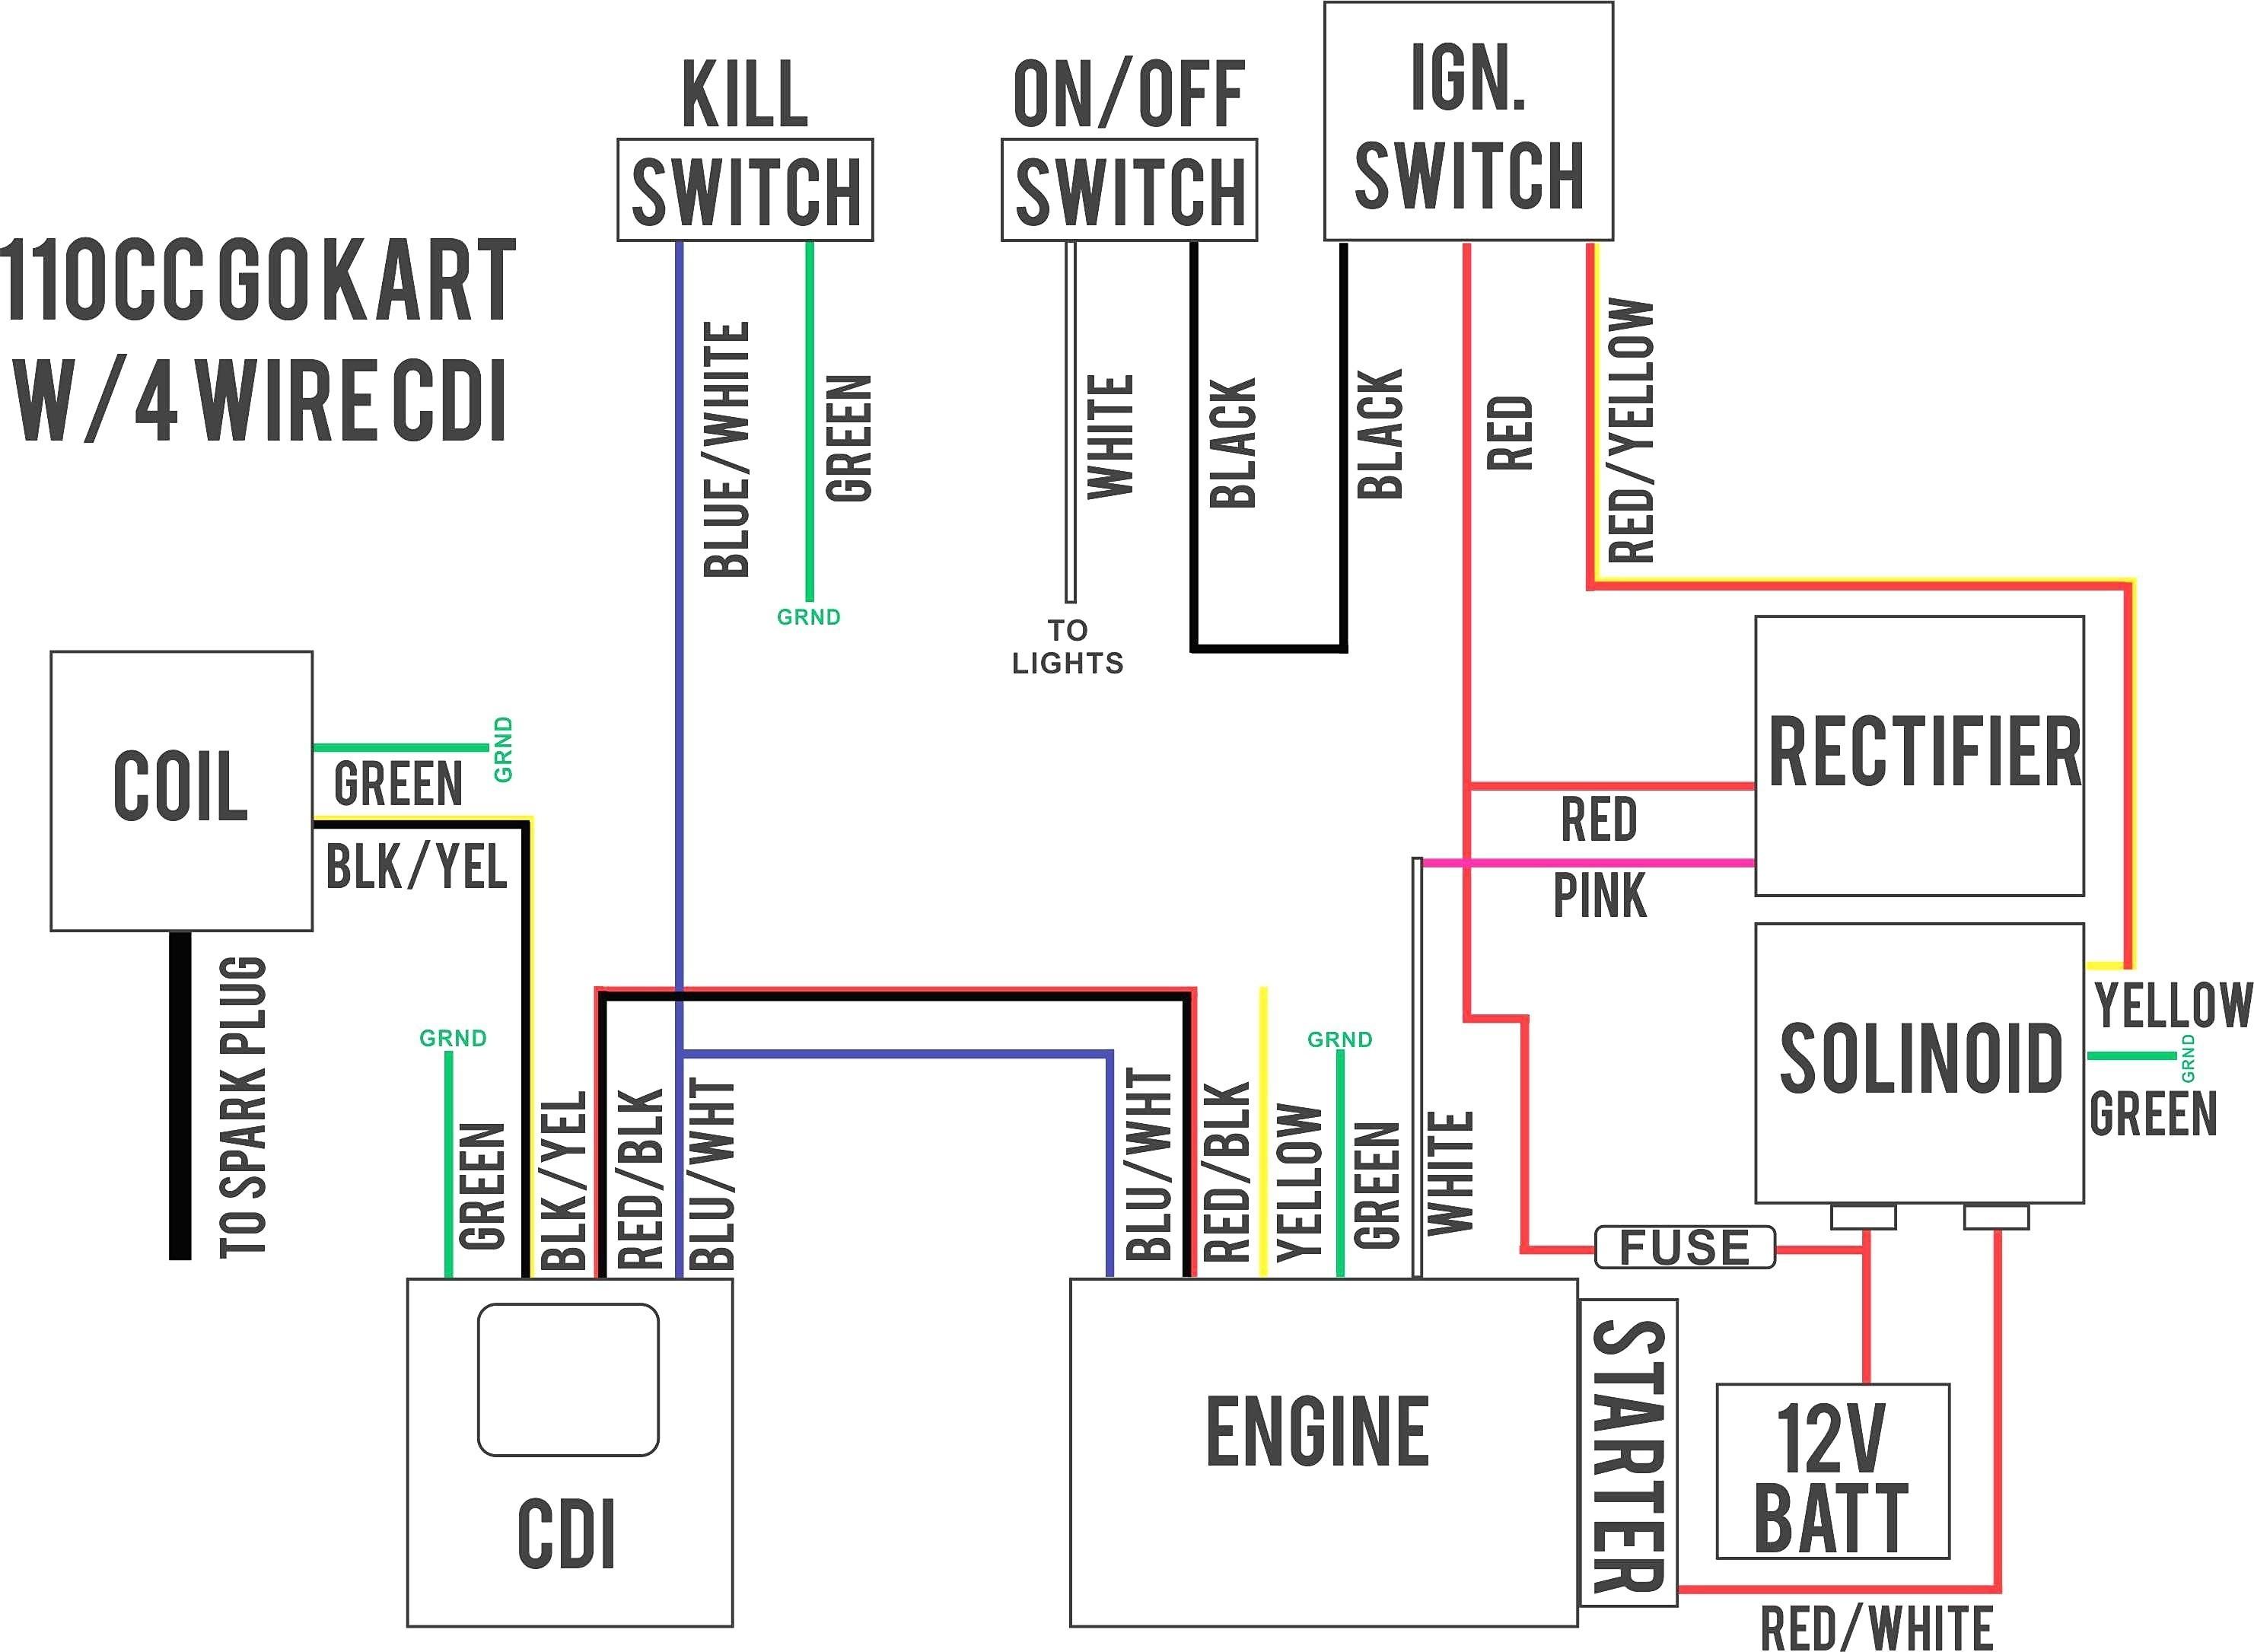 Rd400 Wiring Diagram - Wiring Diagram Third Level on fjr1300 wiring diagram, xj650 wiring diagram, xv535 wiring diagram, xv1000 wiring diagram, xj1100 wiring diagram, xs650 wiring diagram, xj550 wiring diagram, xt350 wiring diagram, tw200 wiring diagram, xvz1300 wiring diagram, rz350 wiring diagram, xs850 wiring diagram, sr500 wiring diagram, pw50 wiring diagram, xj750 wiring diagram, xs400 wiring diagram, it 250 wiring diagram, yzf r6 wiring diagram, virago wiring diagram, yamaha wiring diagram,